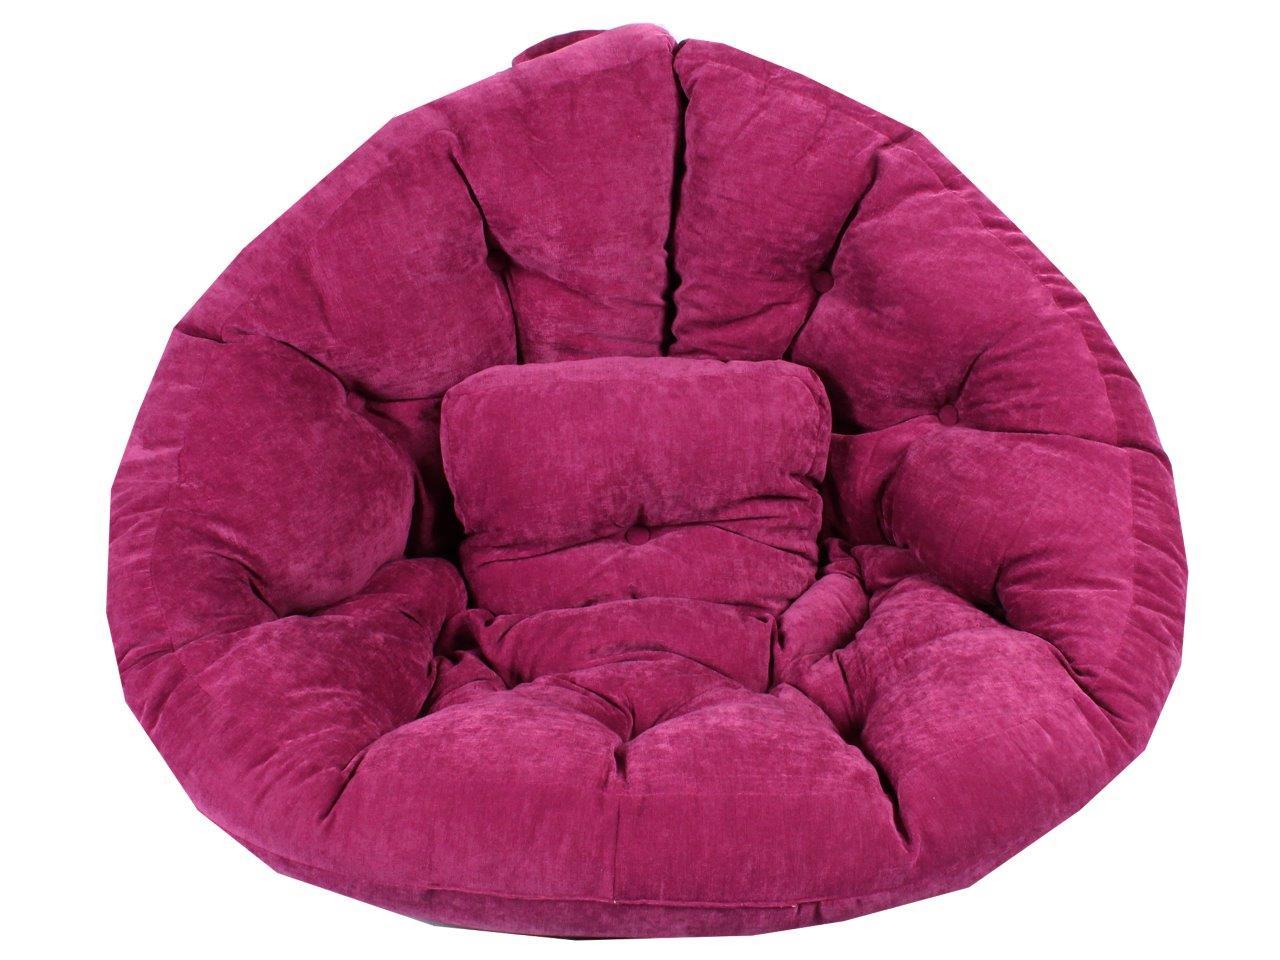 sitzsack kuschelig bodenkissen relax liege kissen sessel. Black Bedroom Furniture Sets. Home Design Ideas